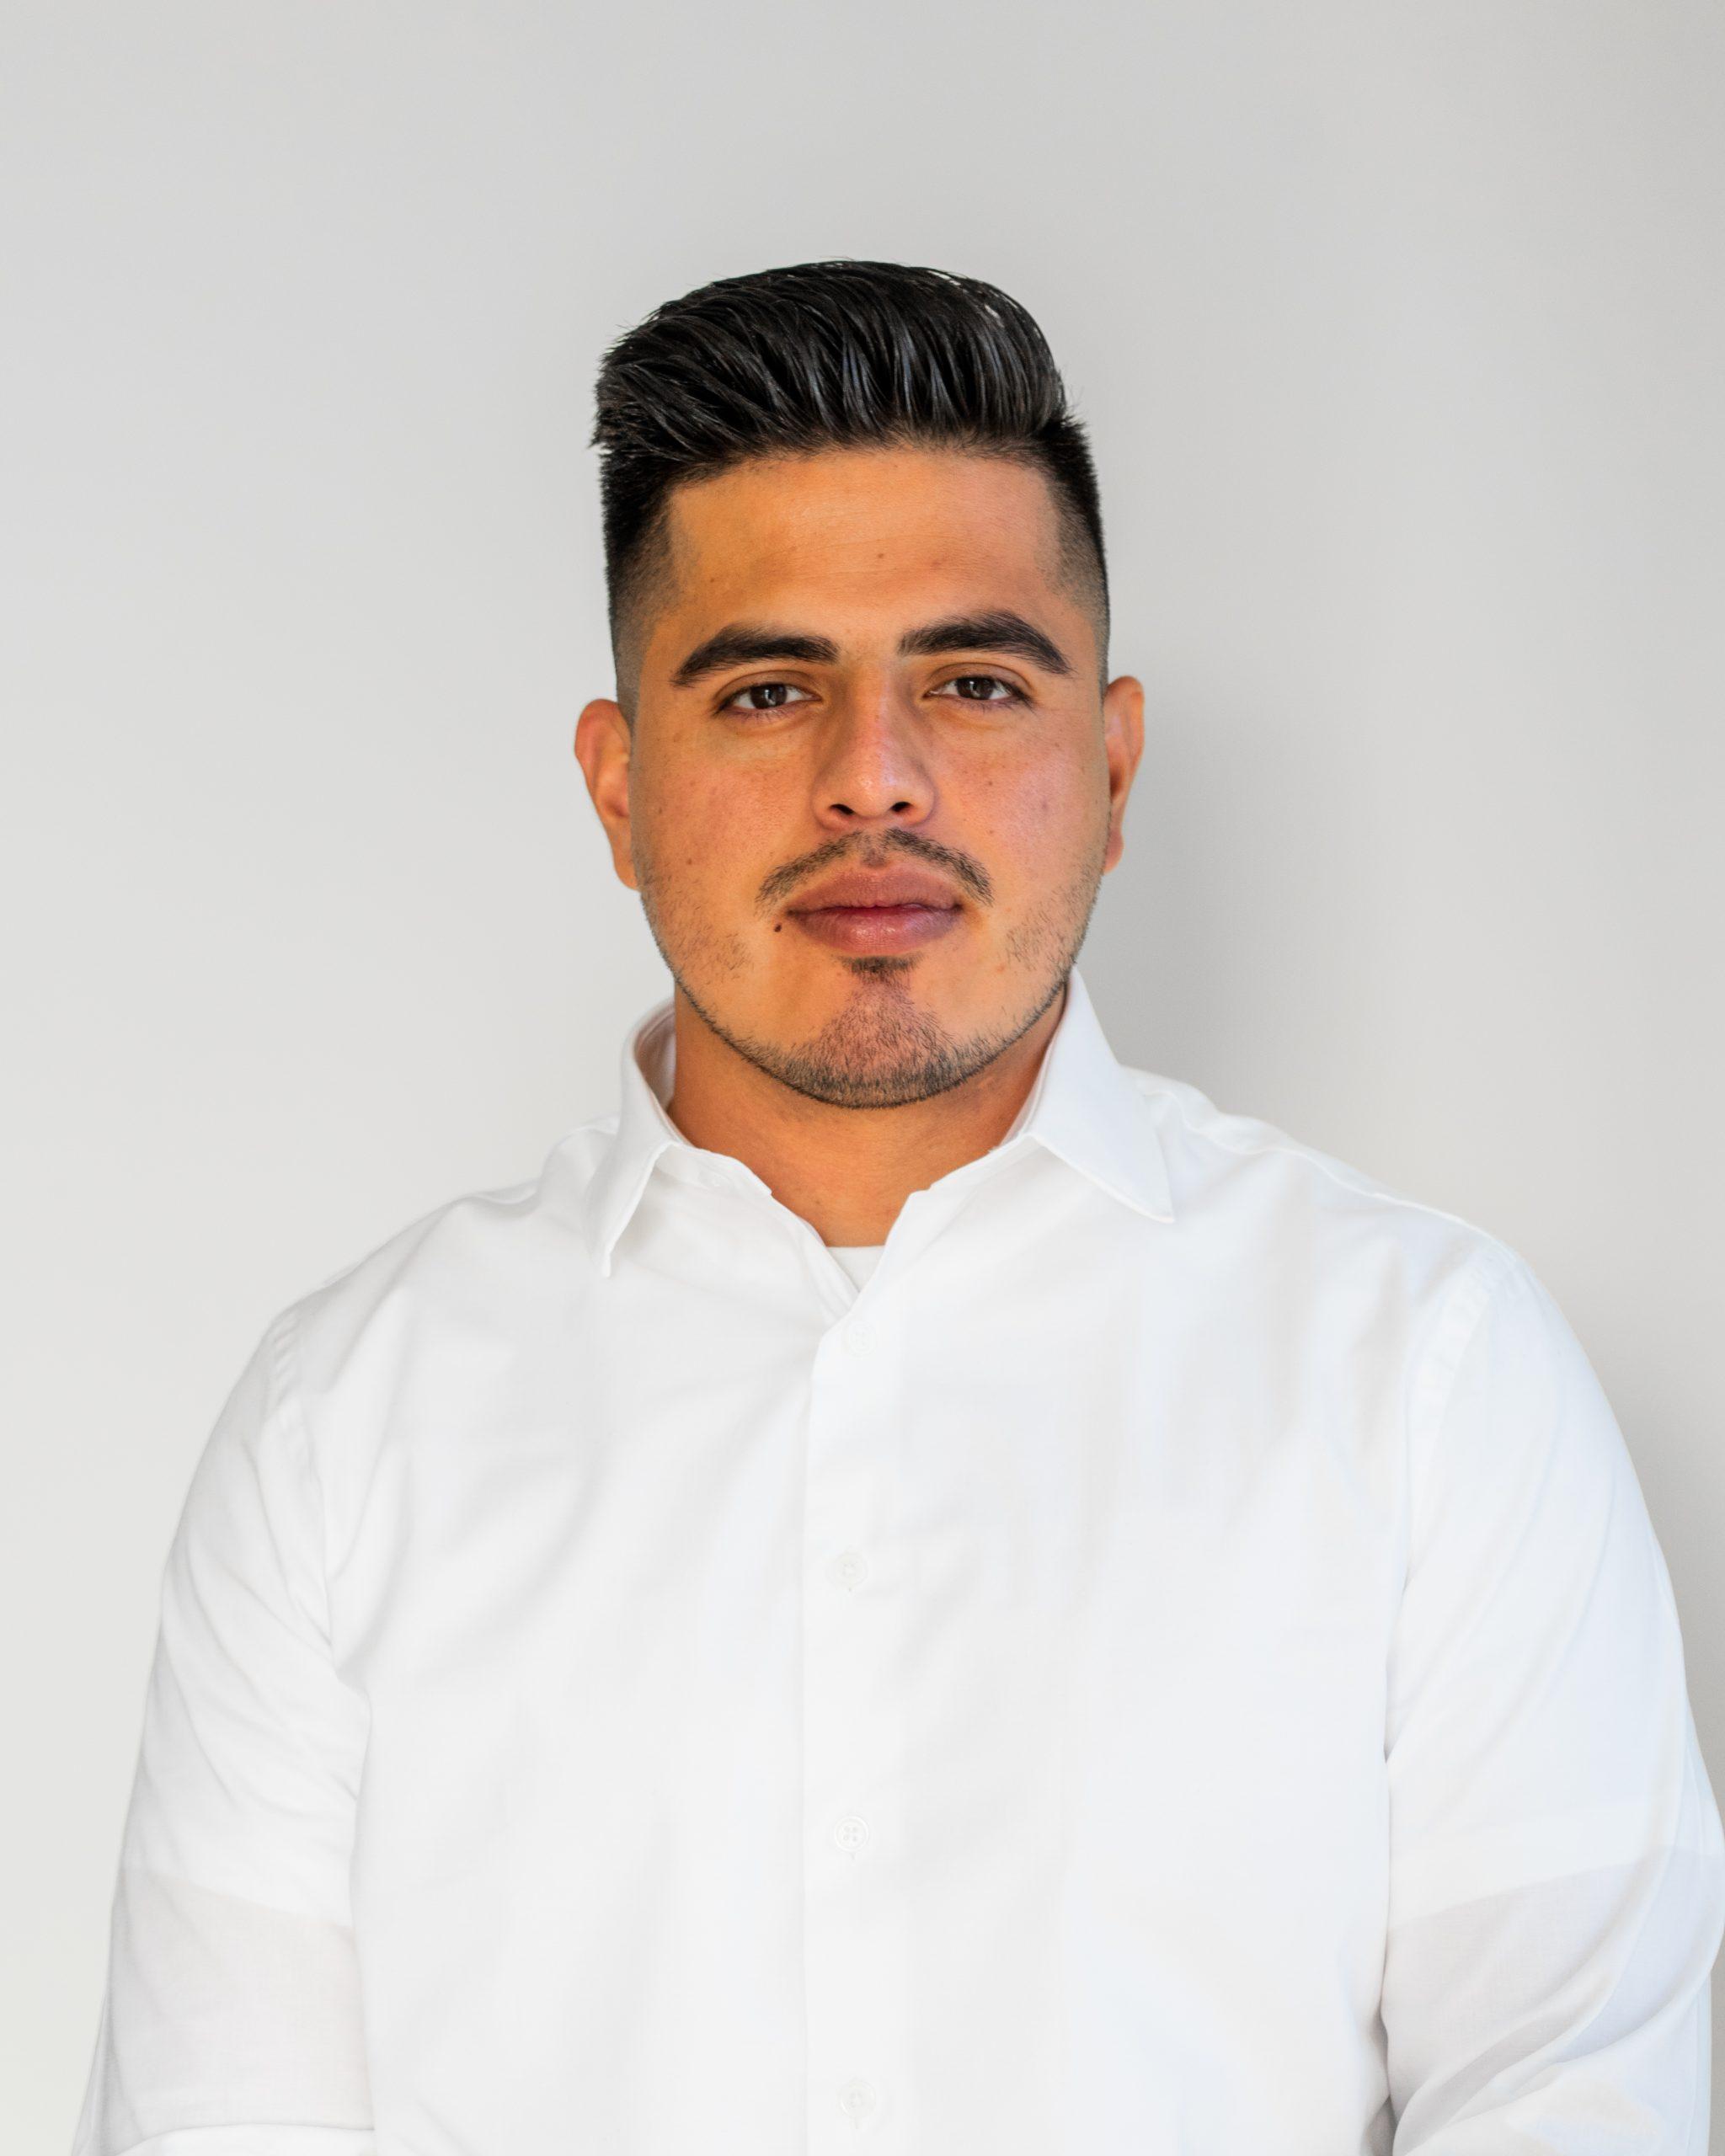 Jesse Velasquez